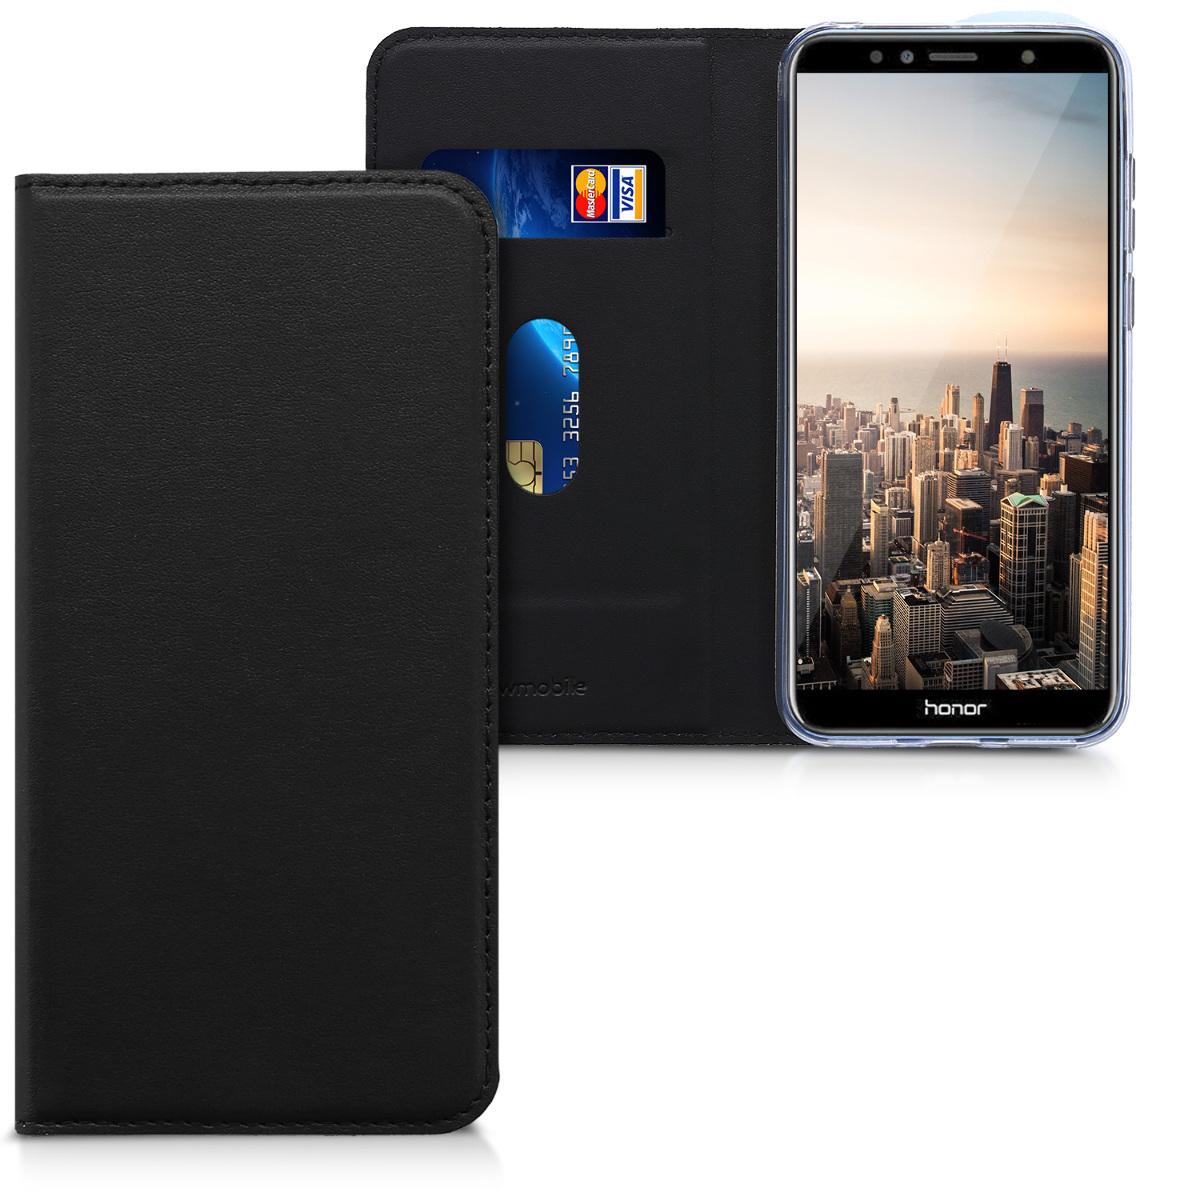 KW Θήκη Flip Huawei Honor 7A - Μαύρο (44826.01)